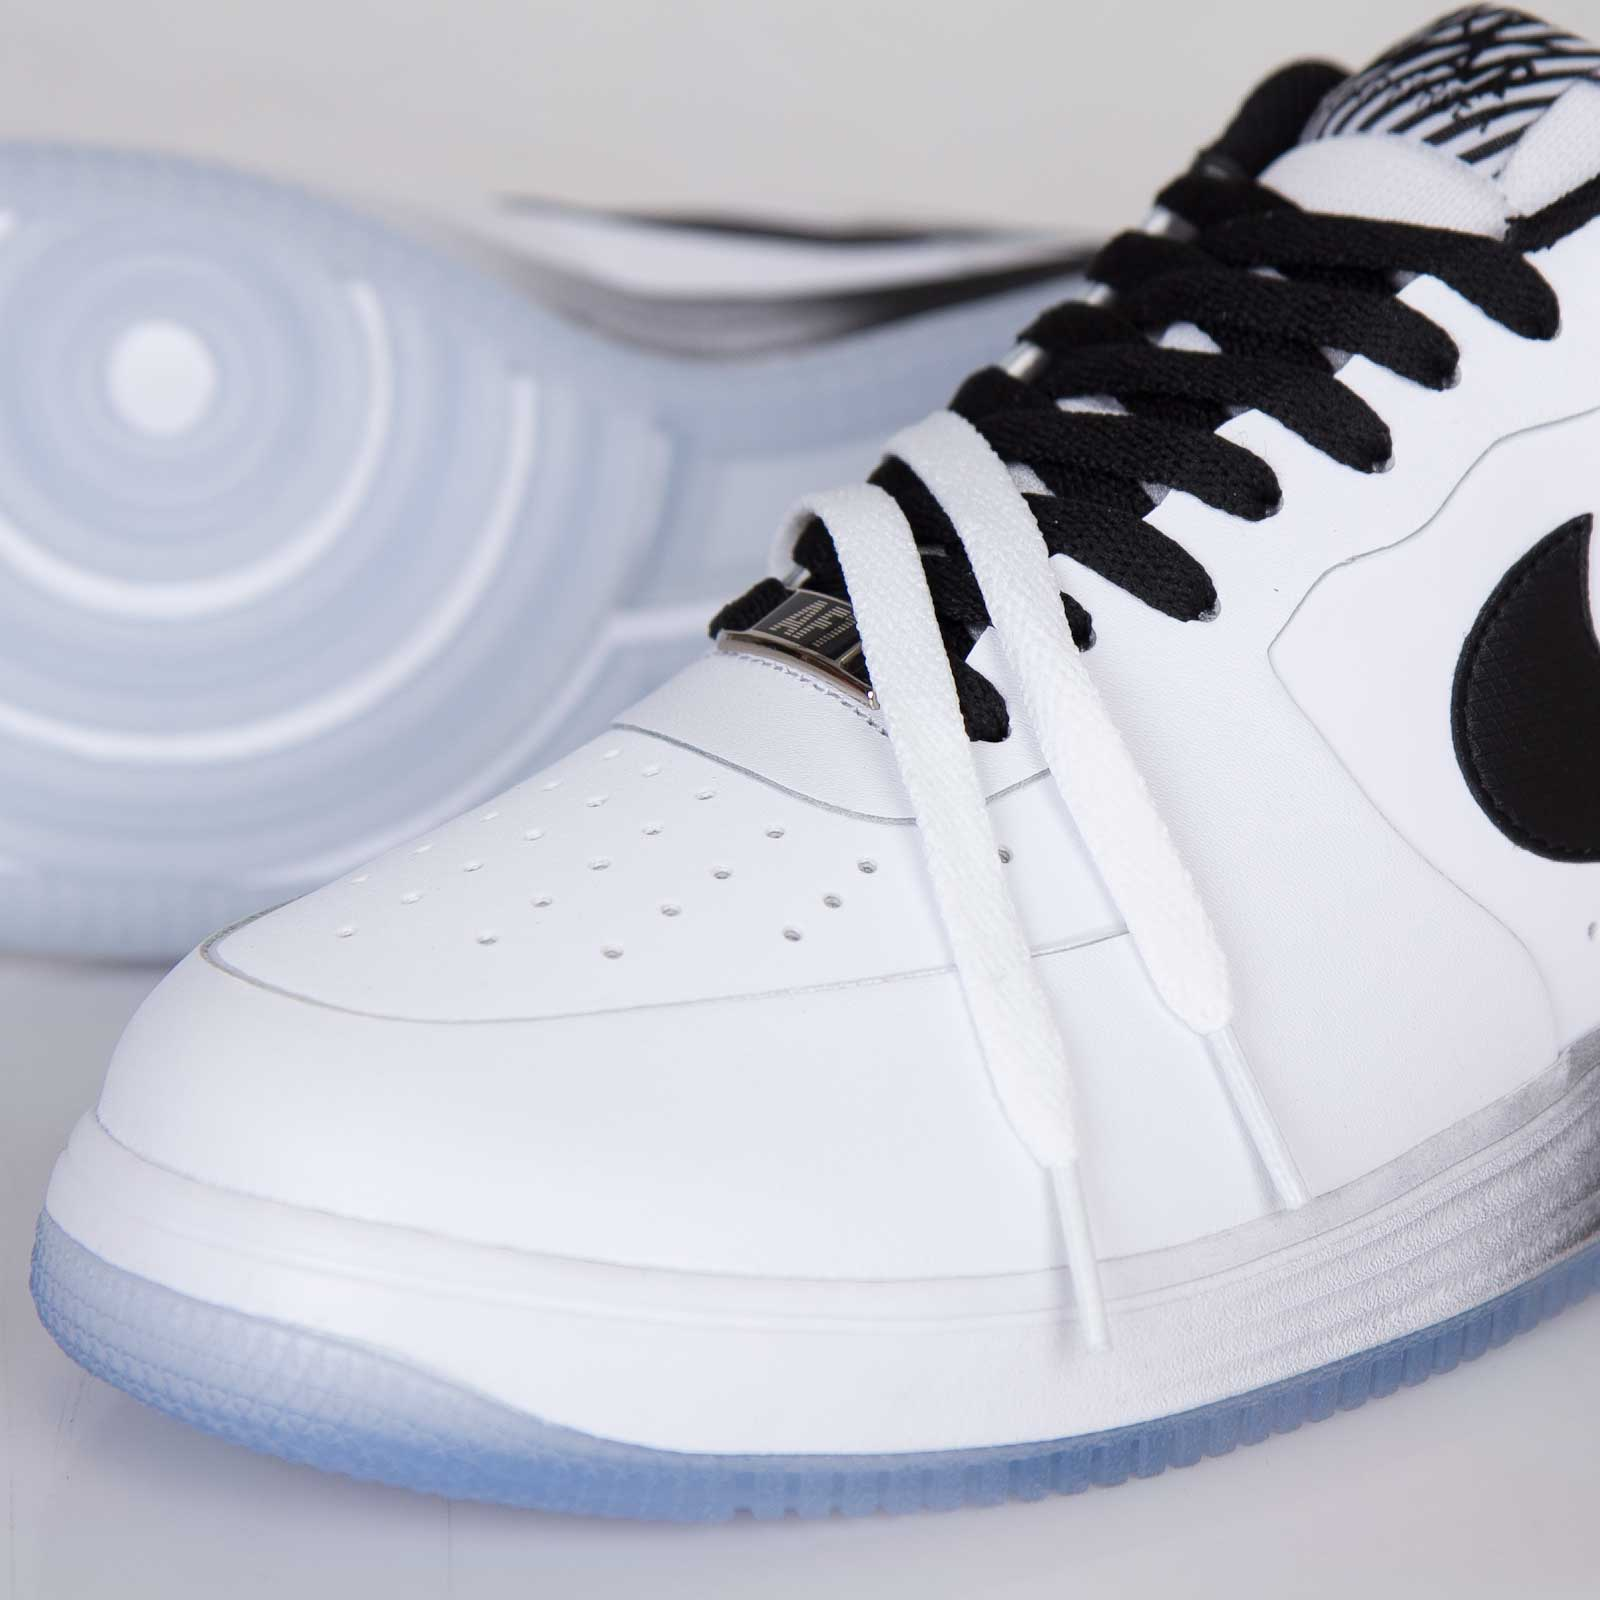 on sale 936d7 91b05 Nike Lunar Force 1 NS Premium - 629970-100 - Sneakersnstuff ...